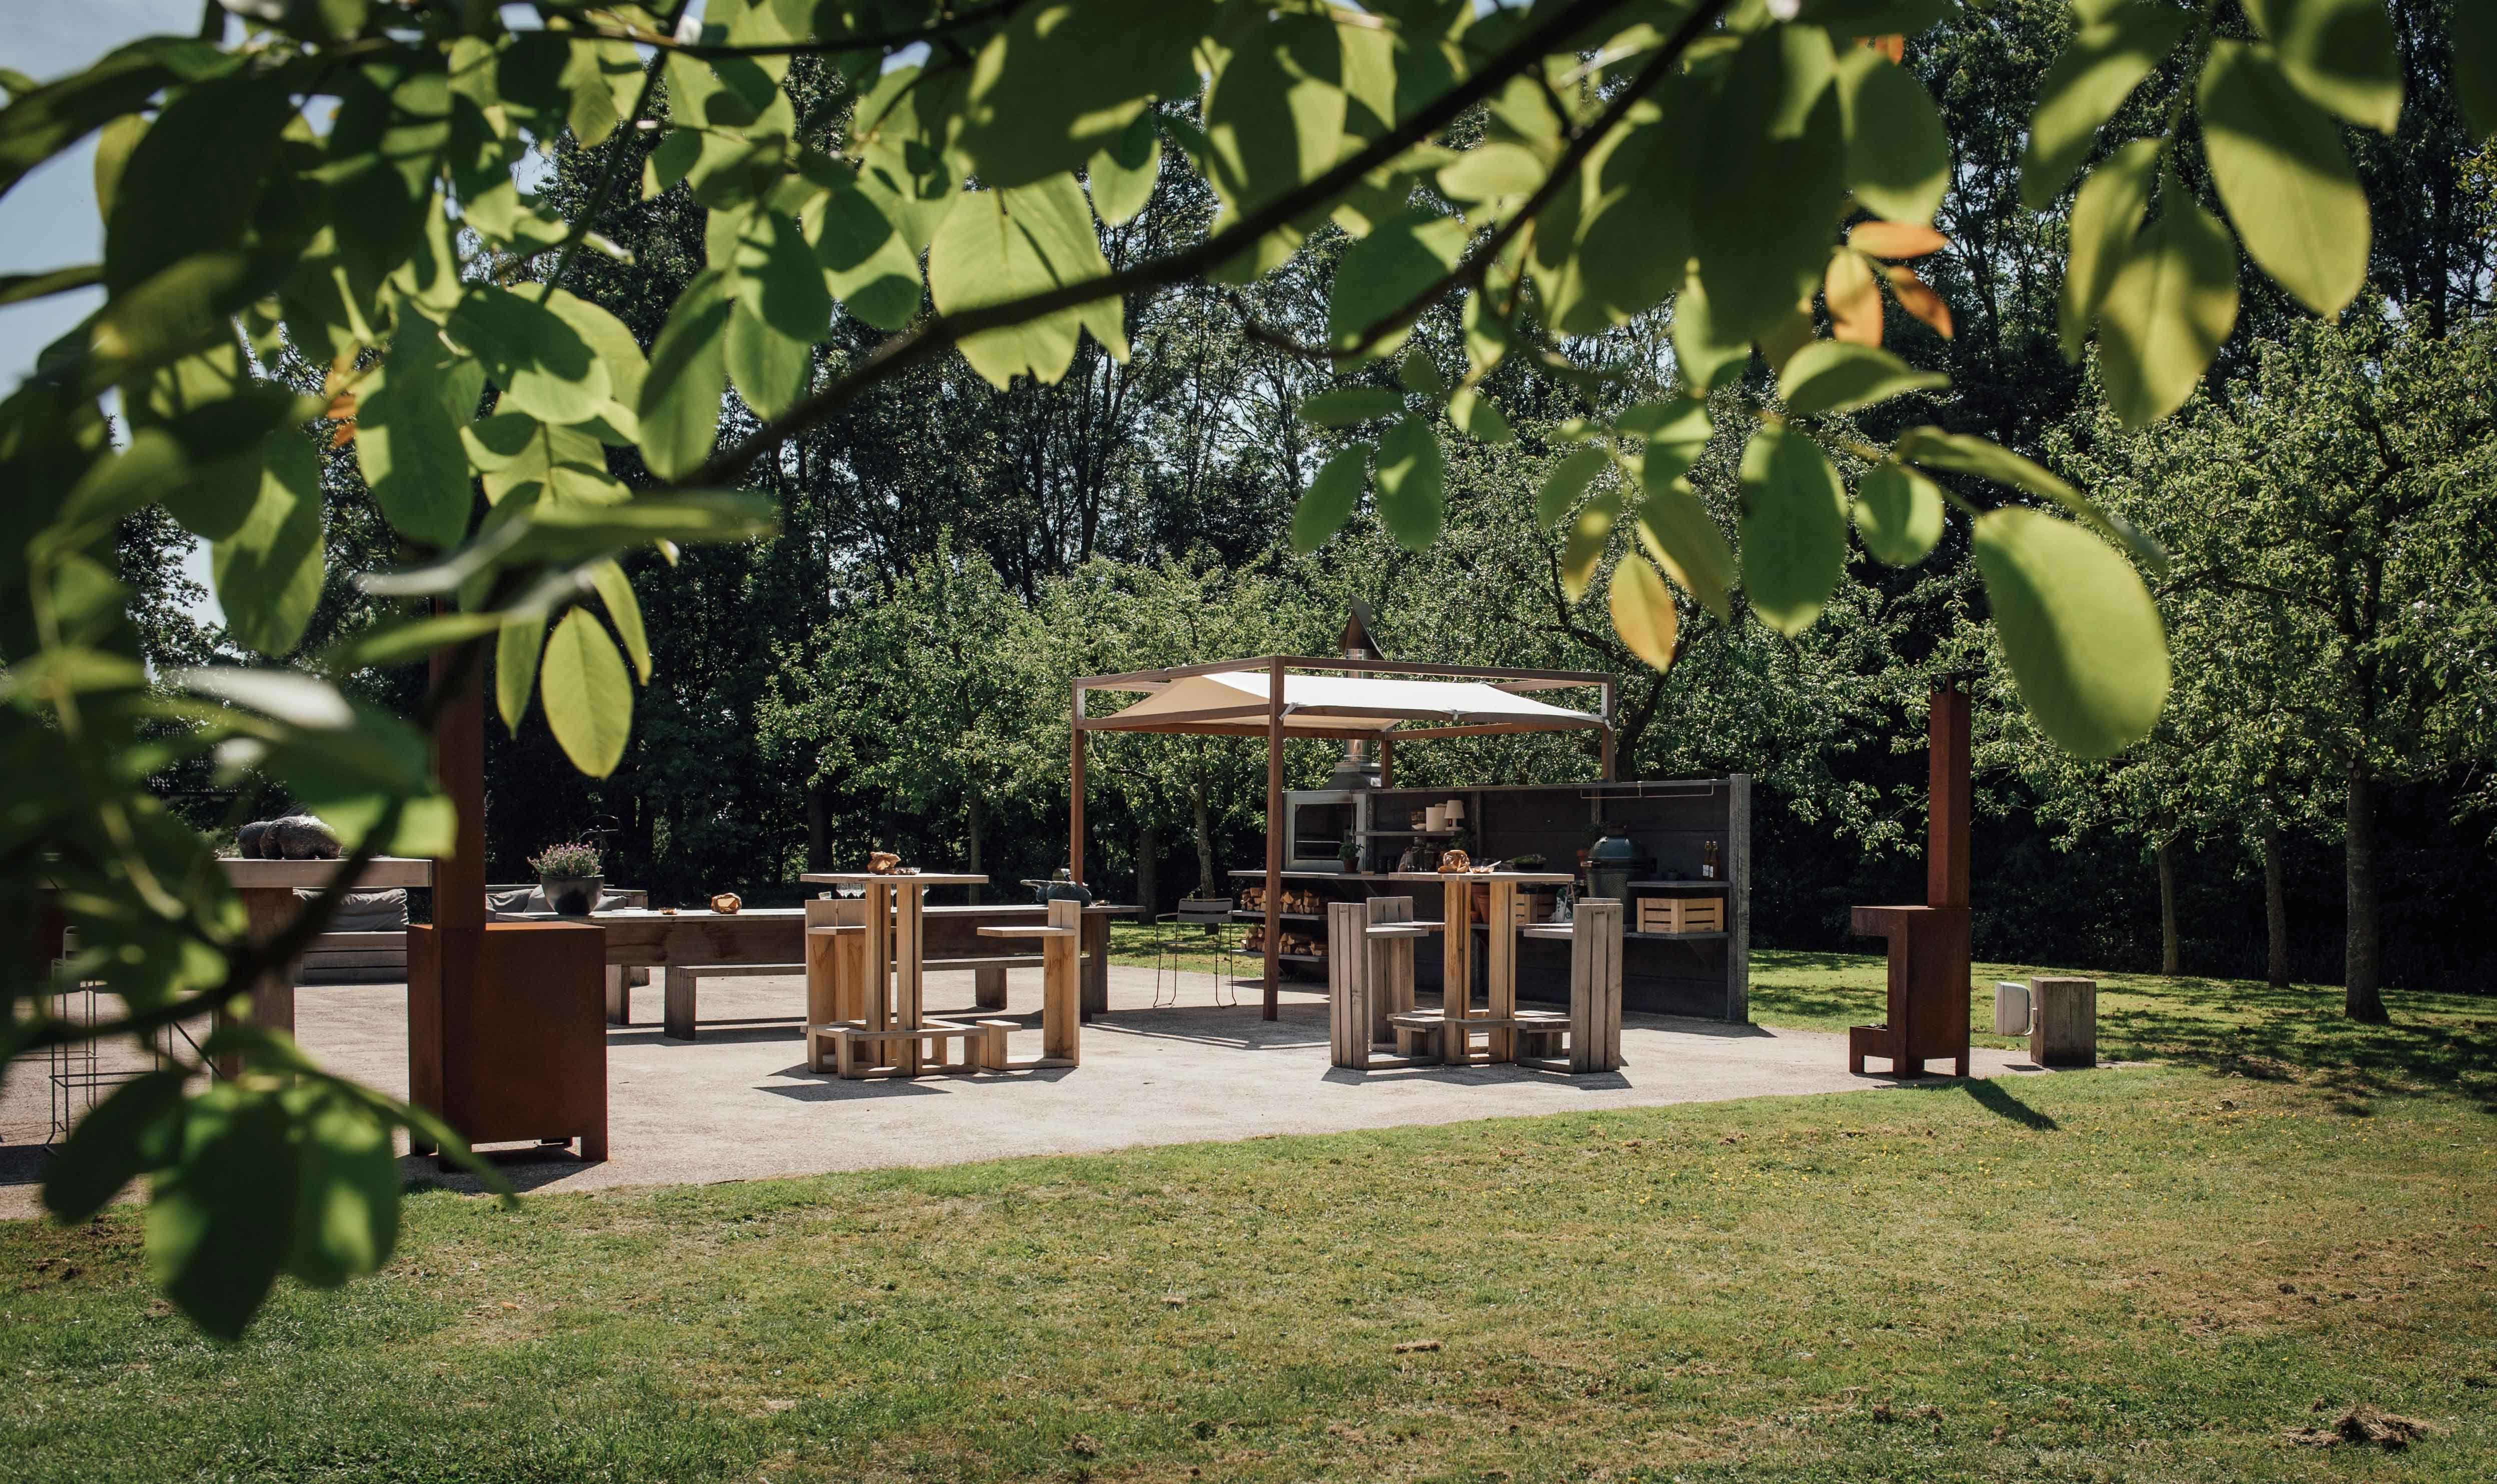 Outdoor Küche Wwoo : Küche outdoor küche ideen attraktiv outdoor küche mauern ideen